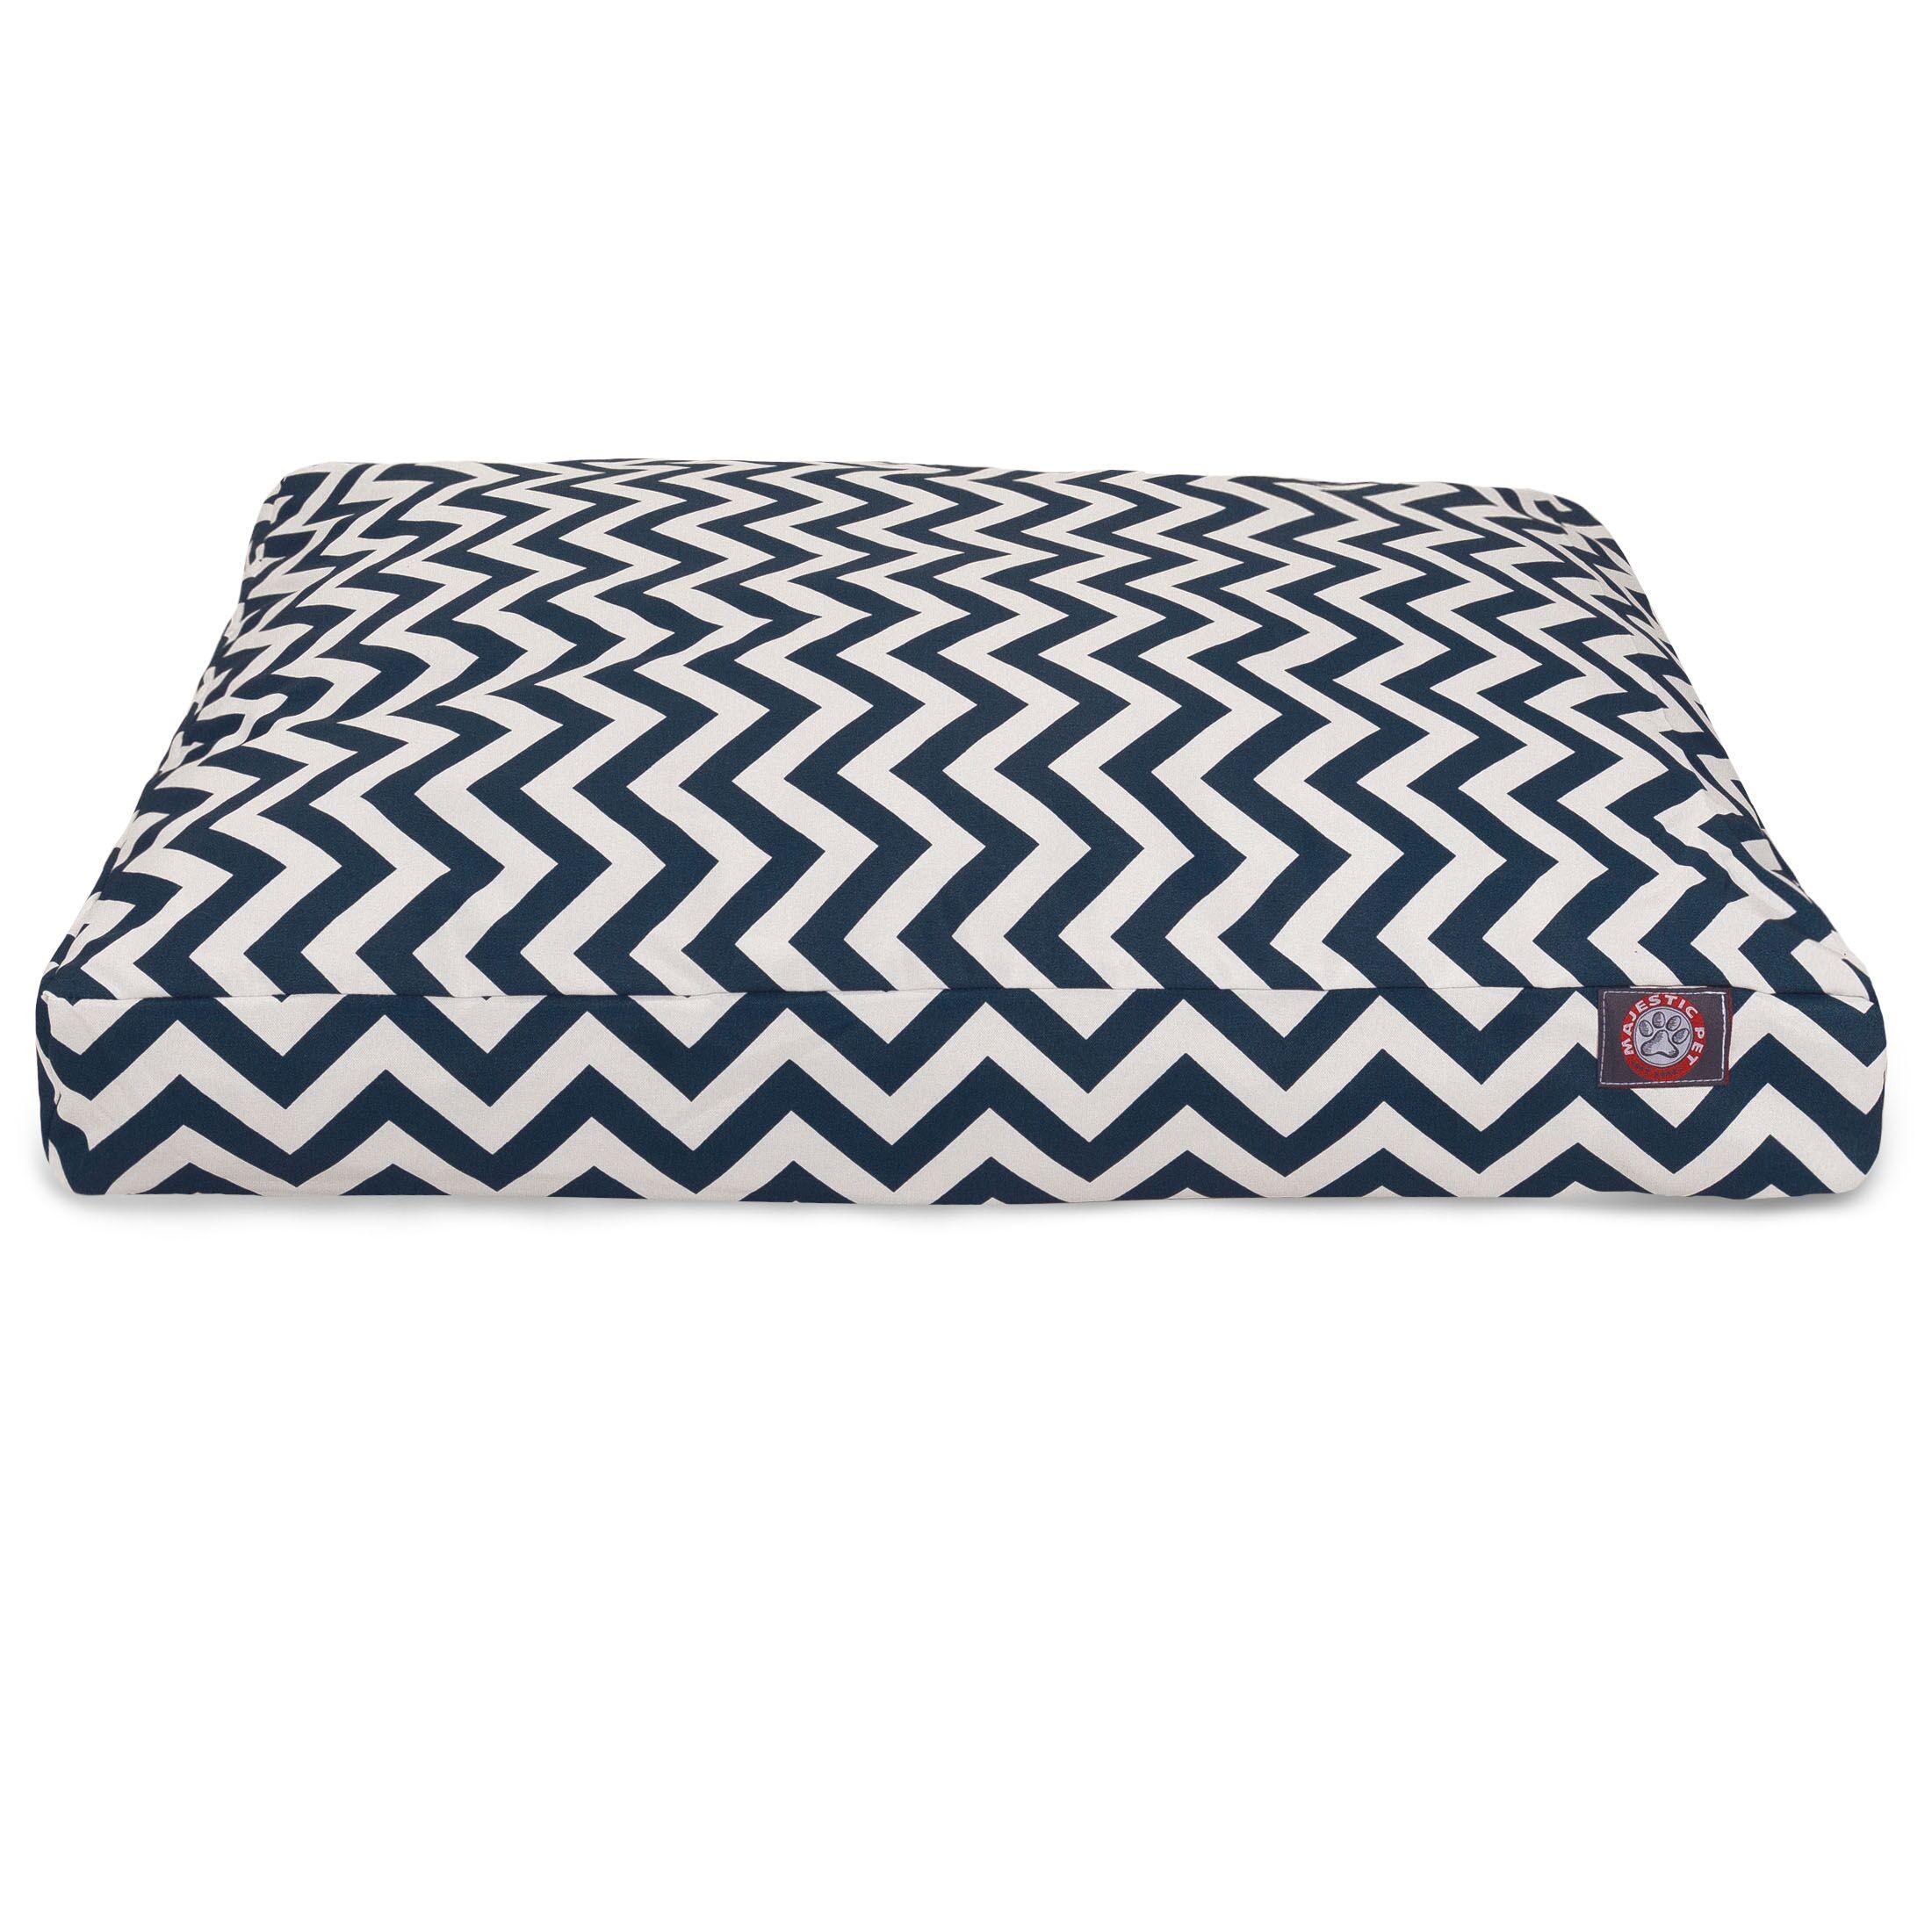 Chevron Rectangle Dog Bed Color: Navy, Size: Medium (44